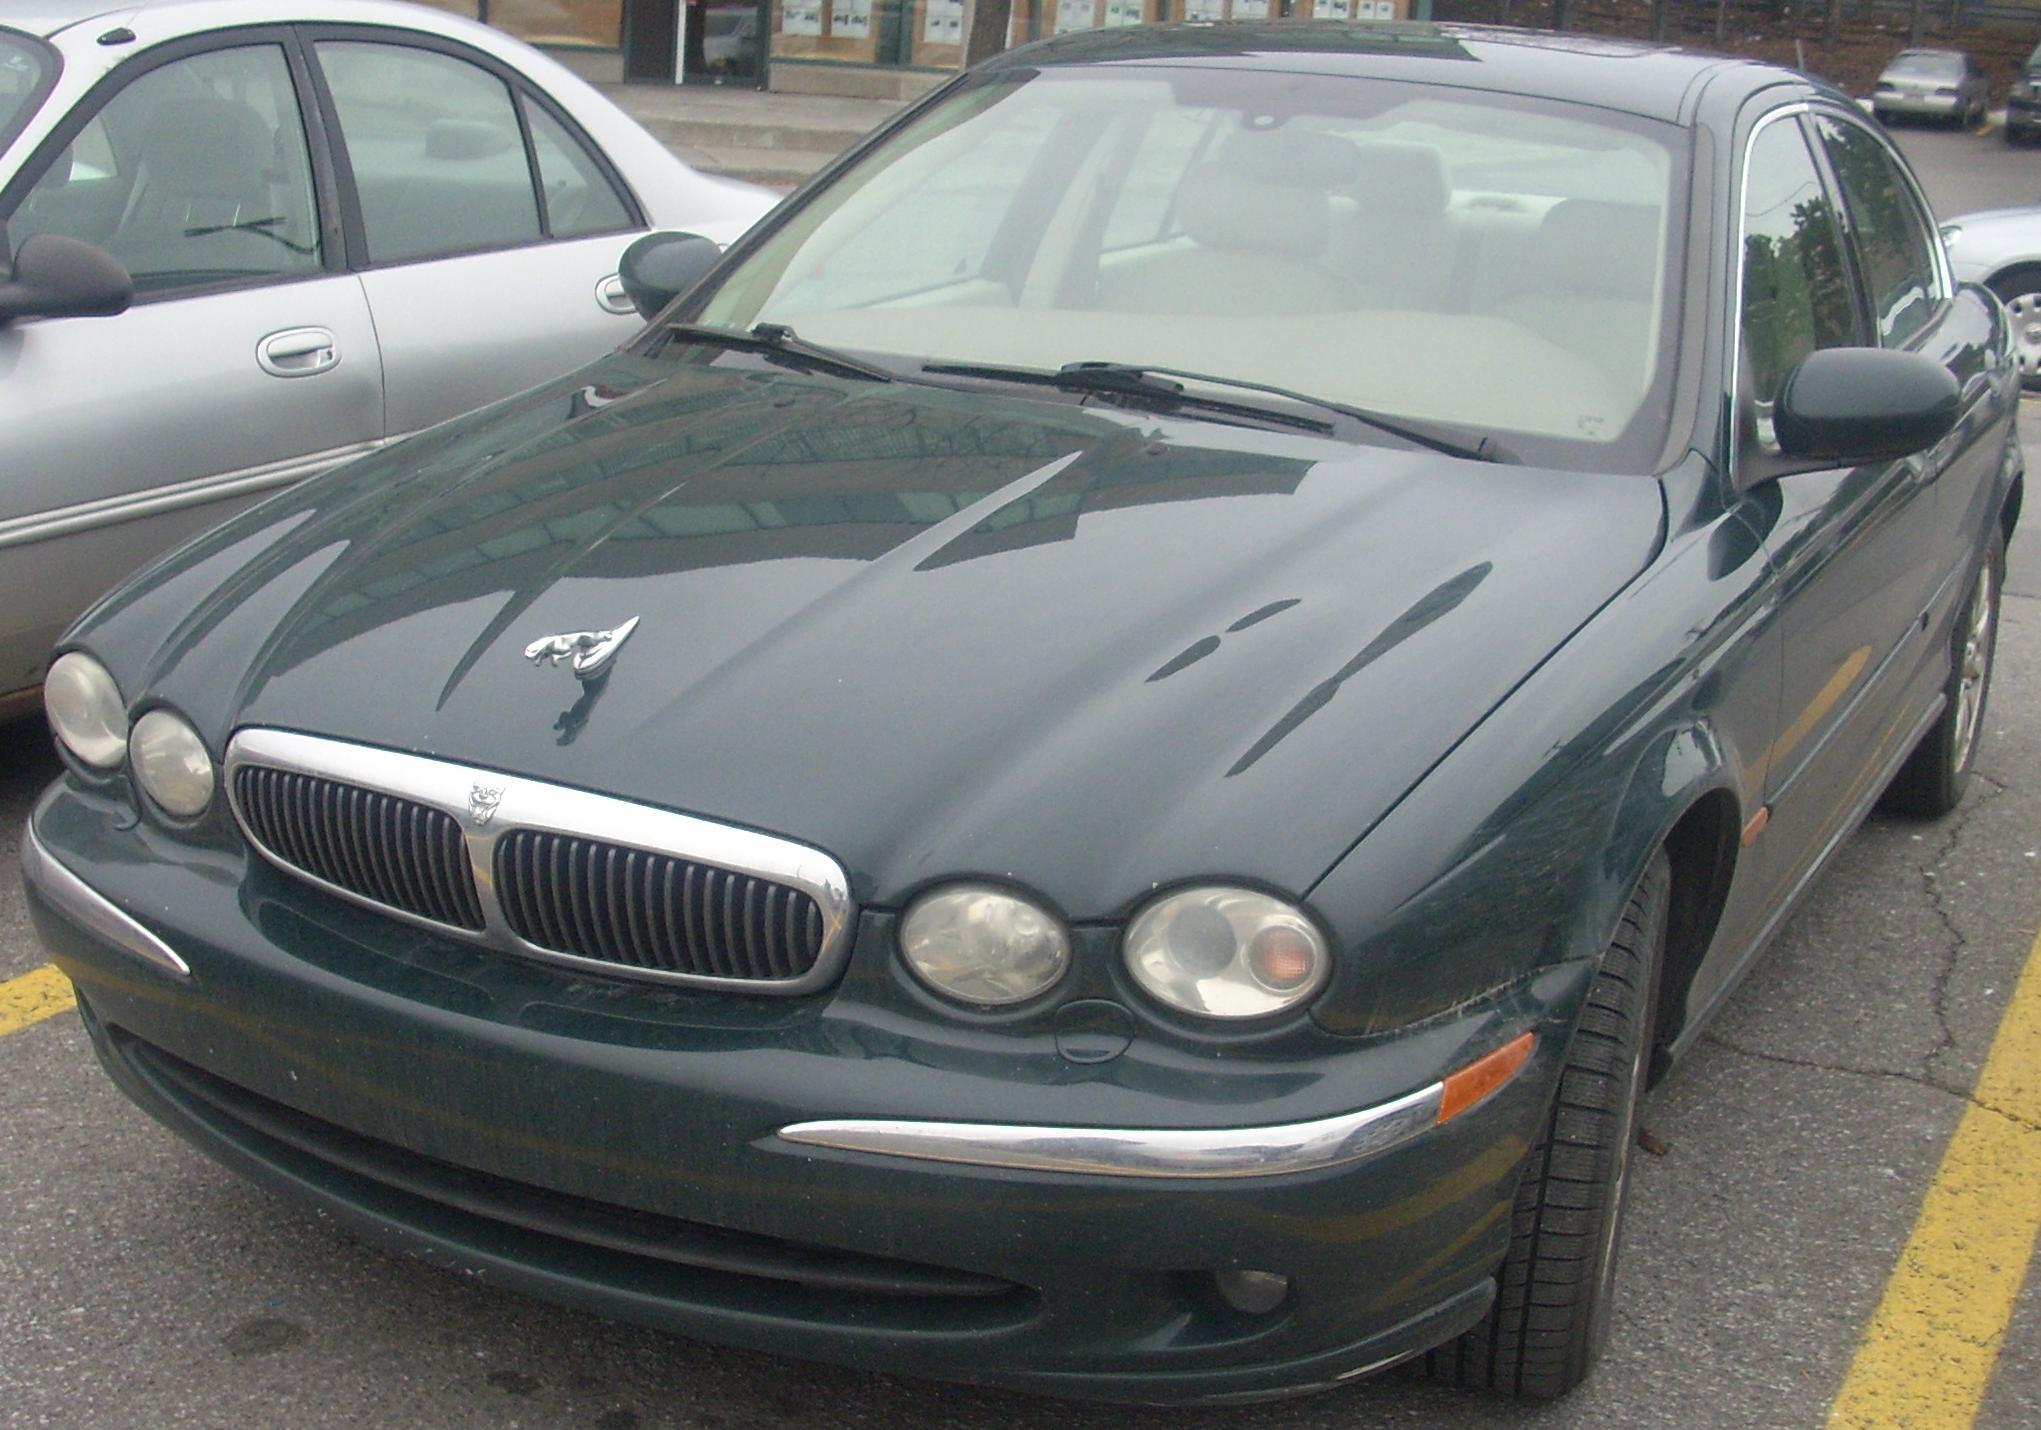 03 jaguar x type